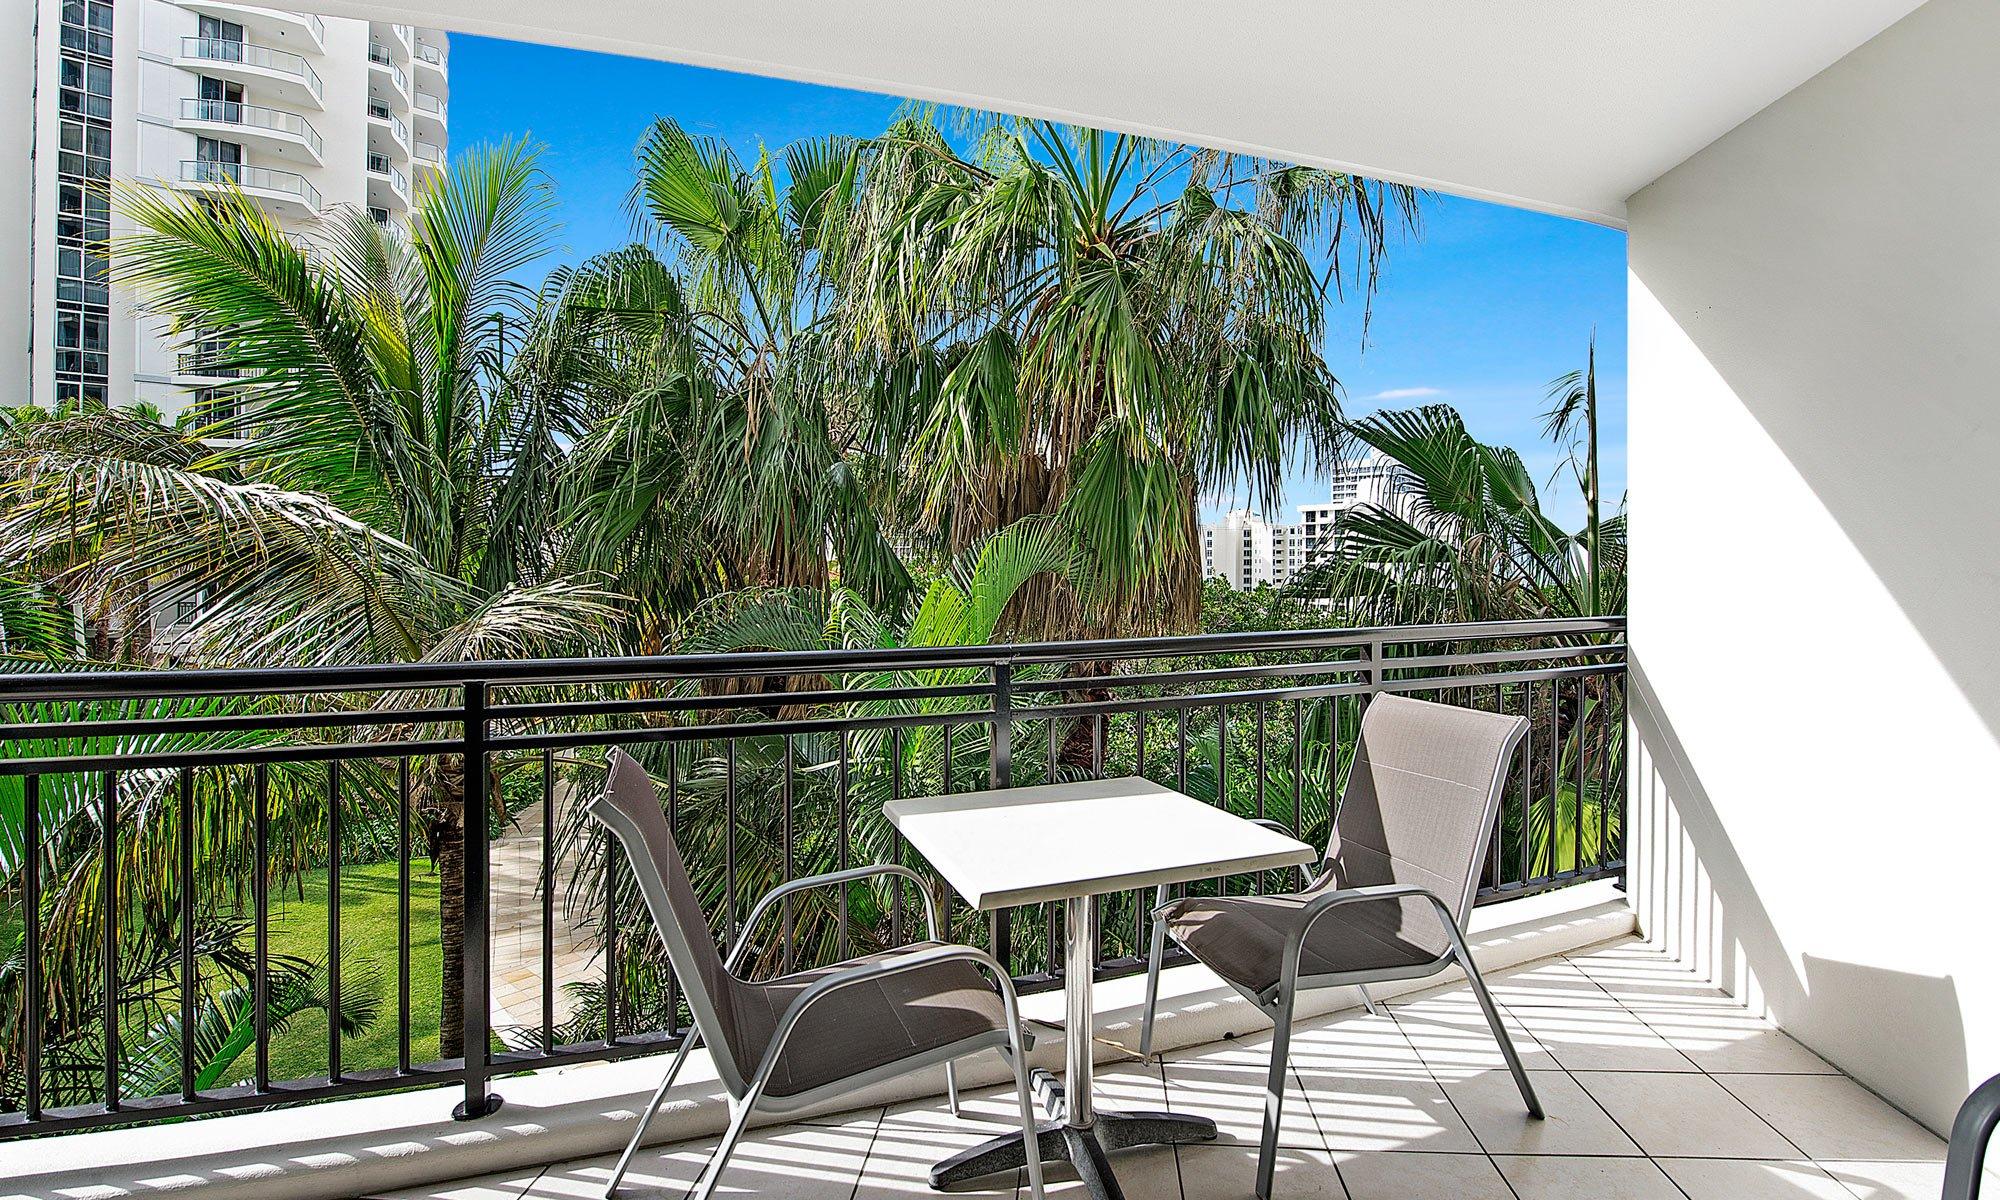 Gold Coast real estate for sale Chevron Renaissance 3073 balcony setting